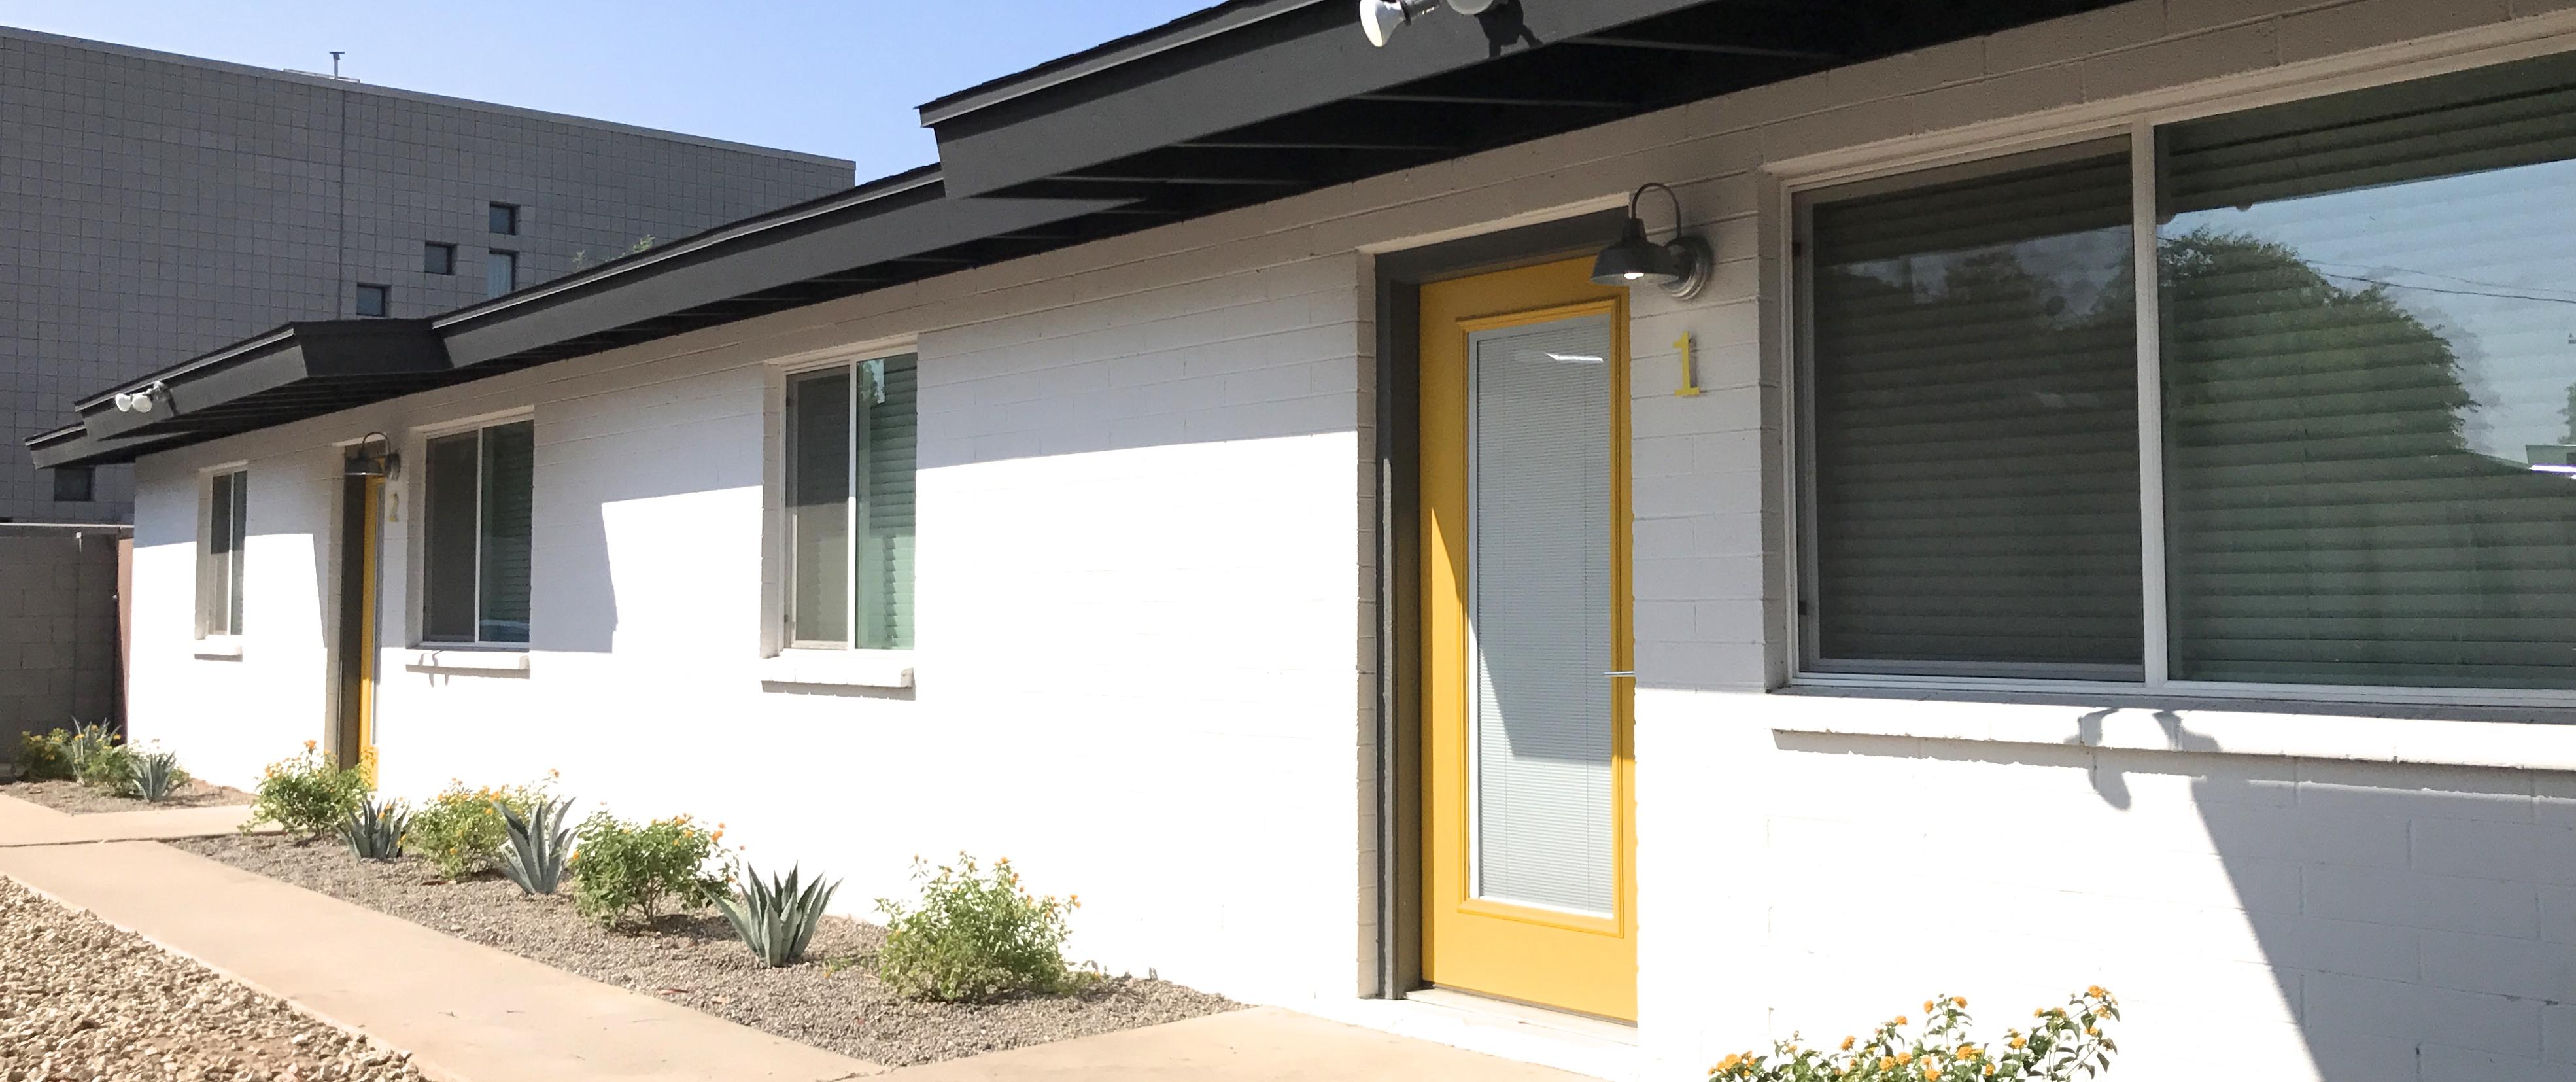 MODE @ Glenrosa   2031 E Glenrosa Ave, Phoenix, AZ 85016